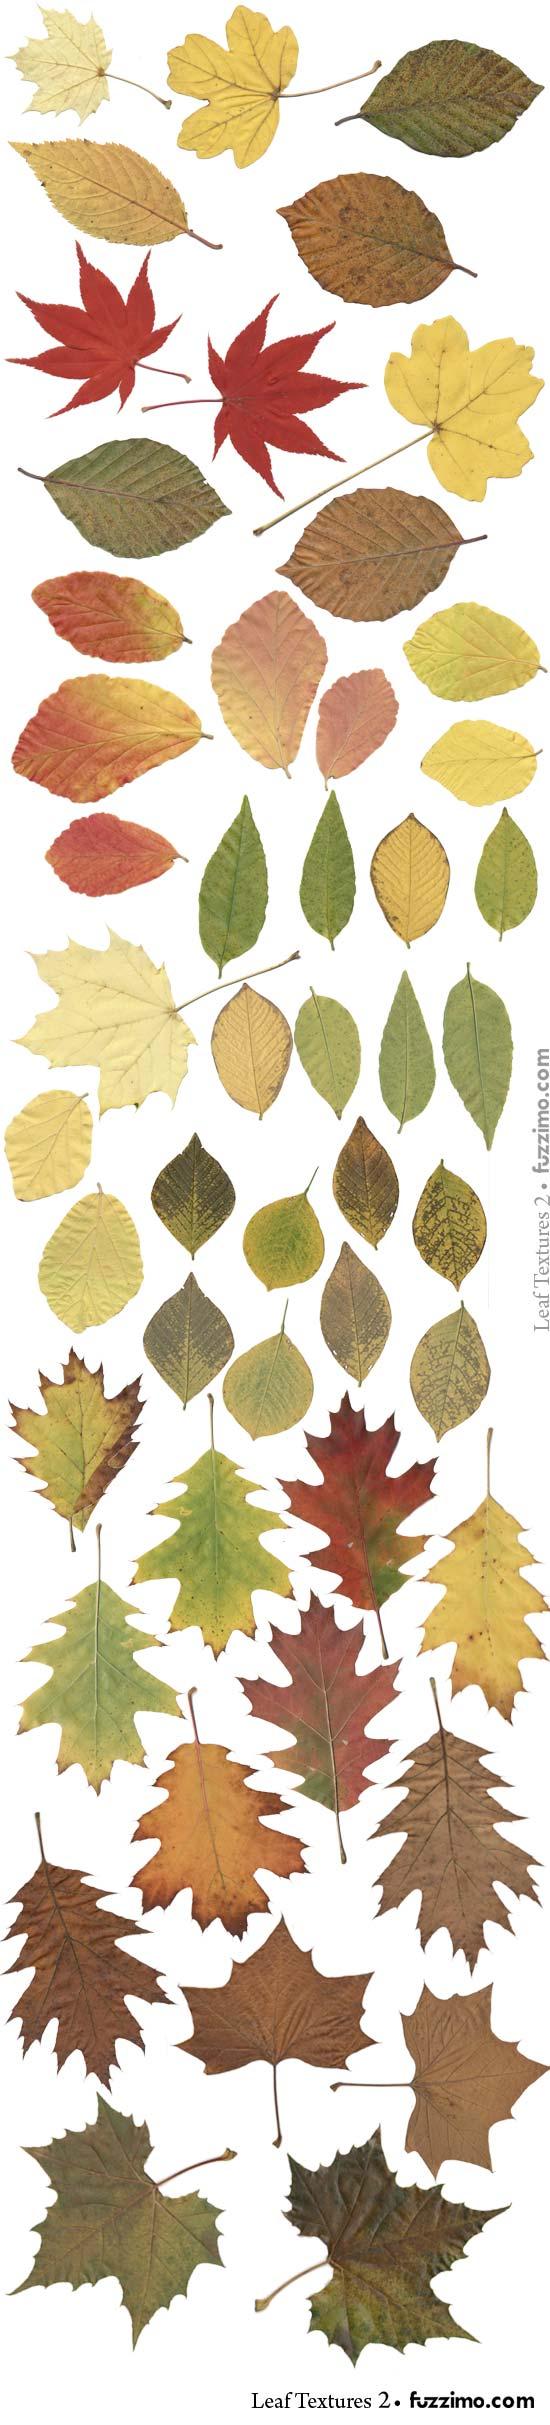 fzm-Leaf-Textures-(2)-02